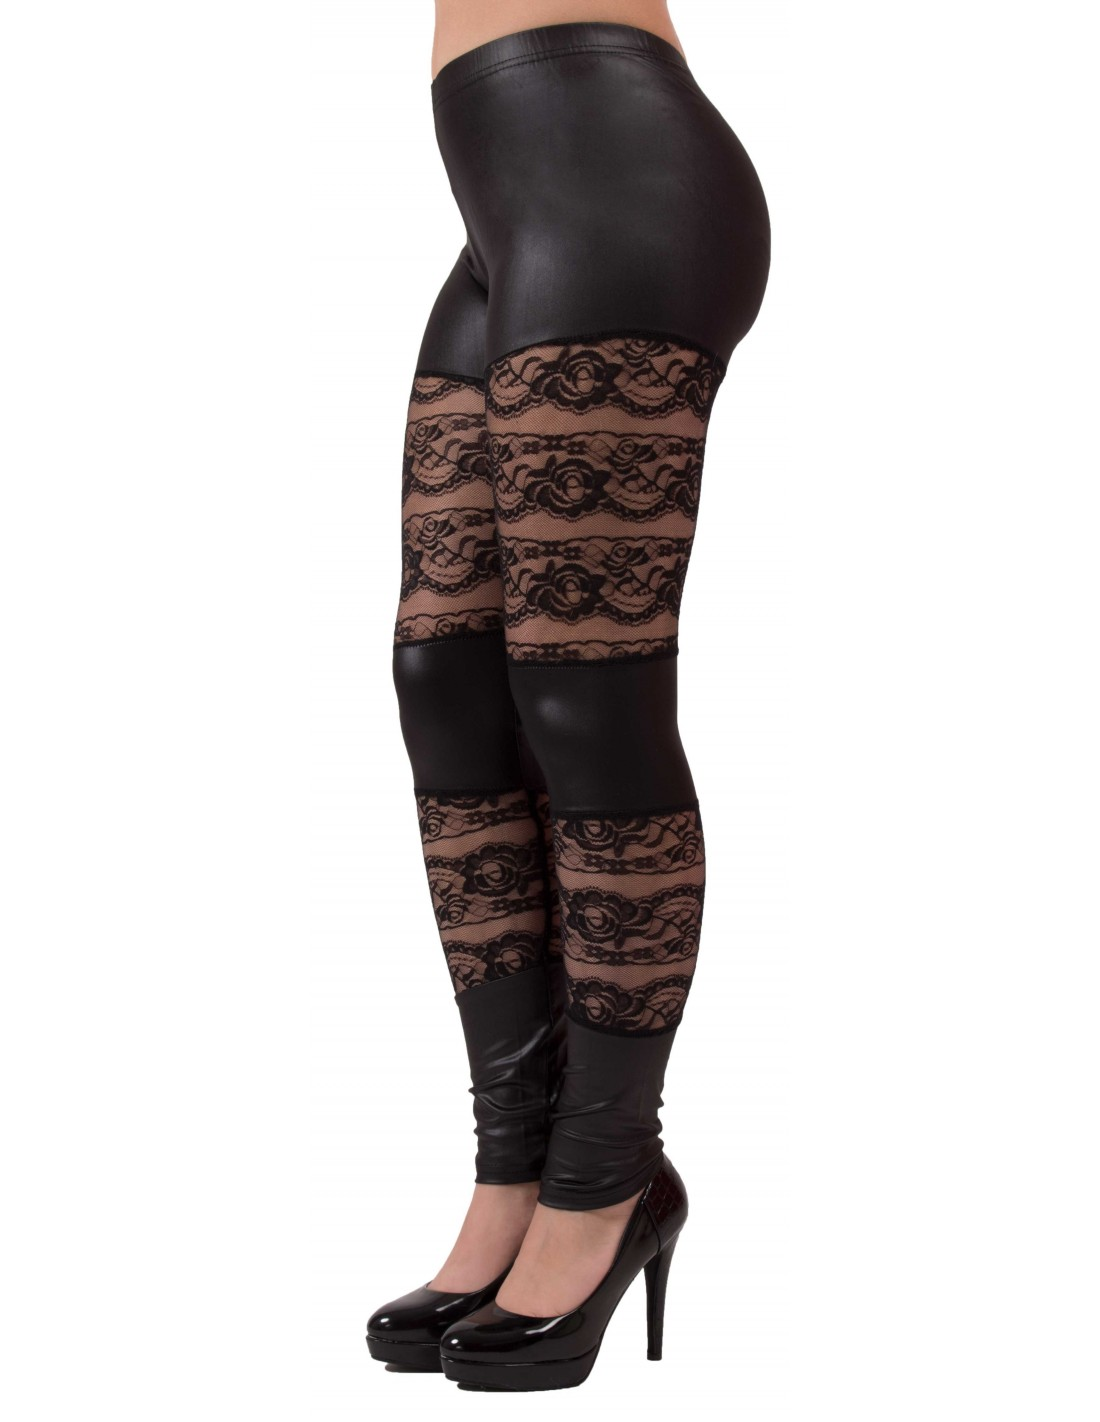 ... Legging noir aspet cuir   dentelle type legging sexy dentelle et vinyl  ... bfca460a7b0